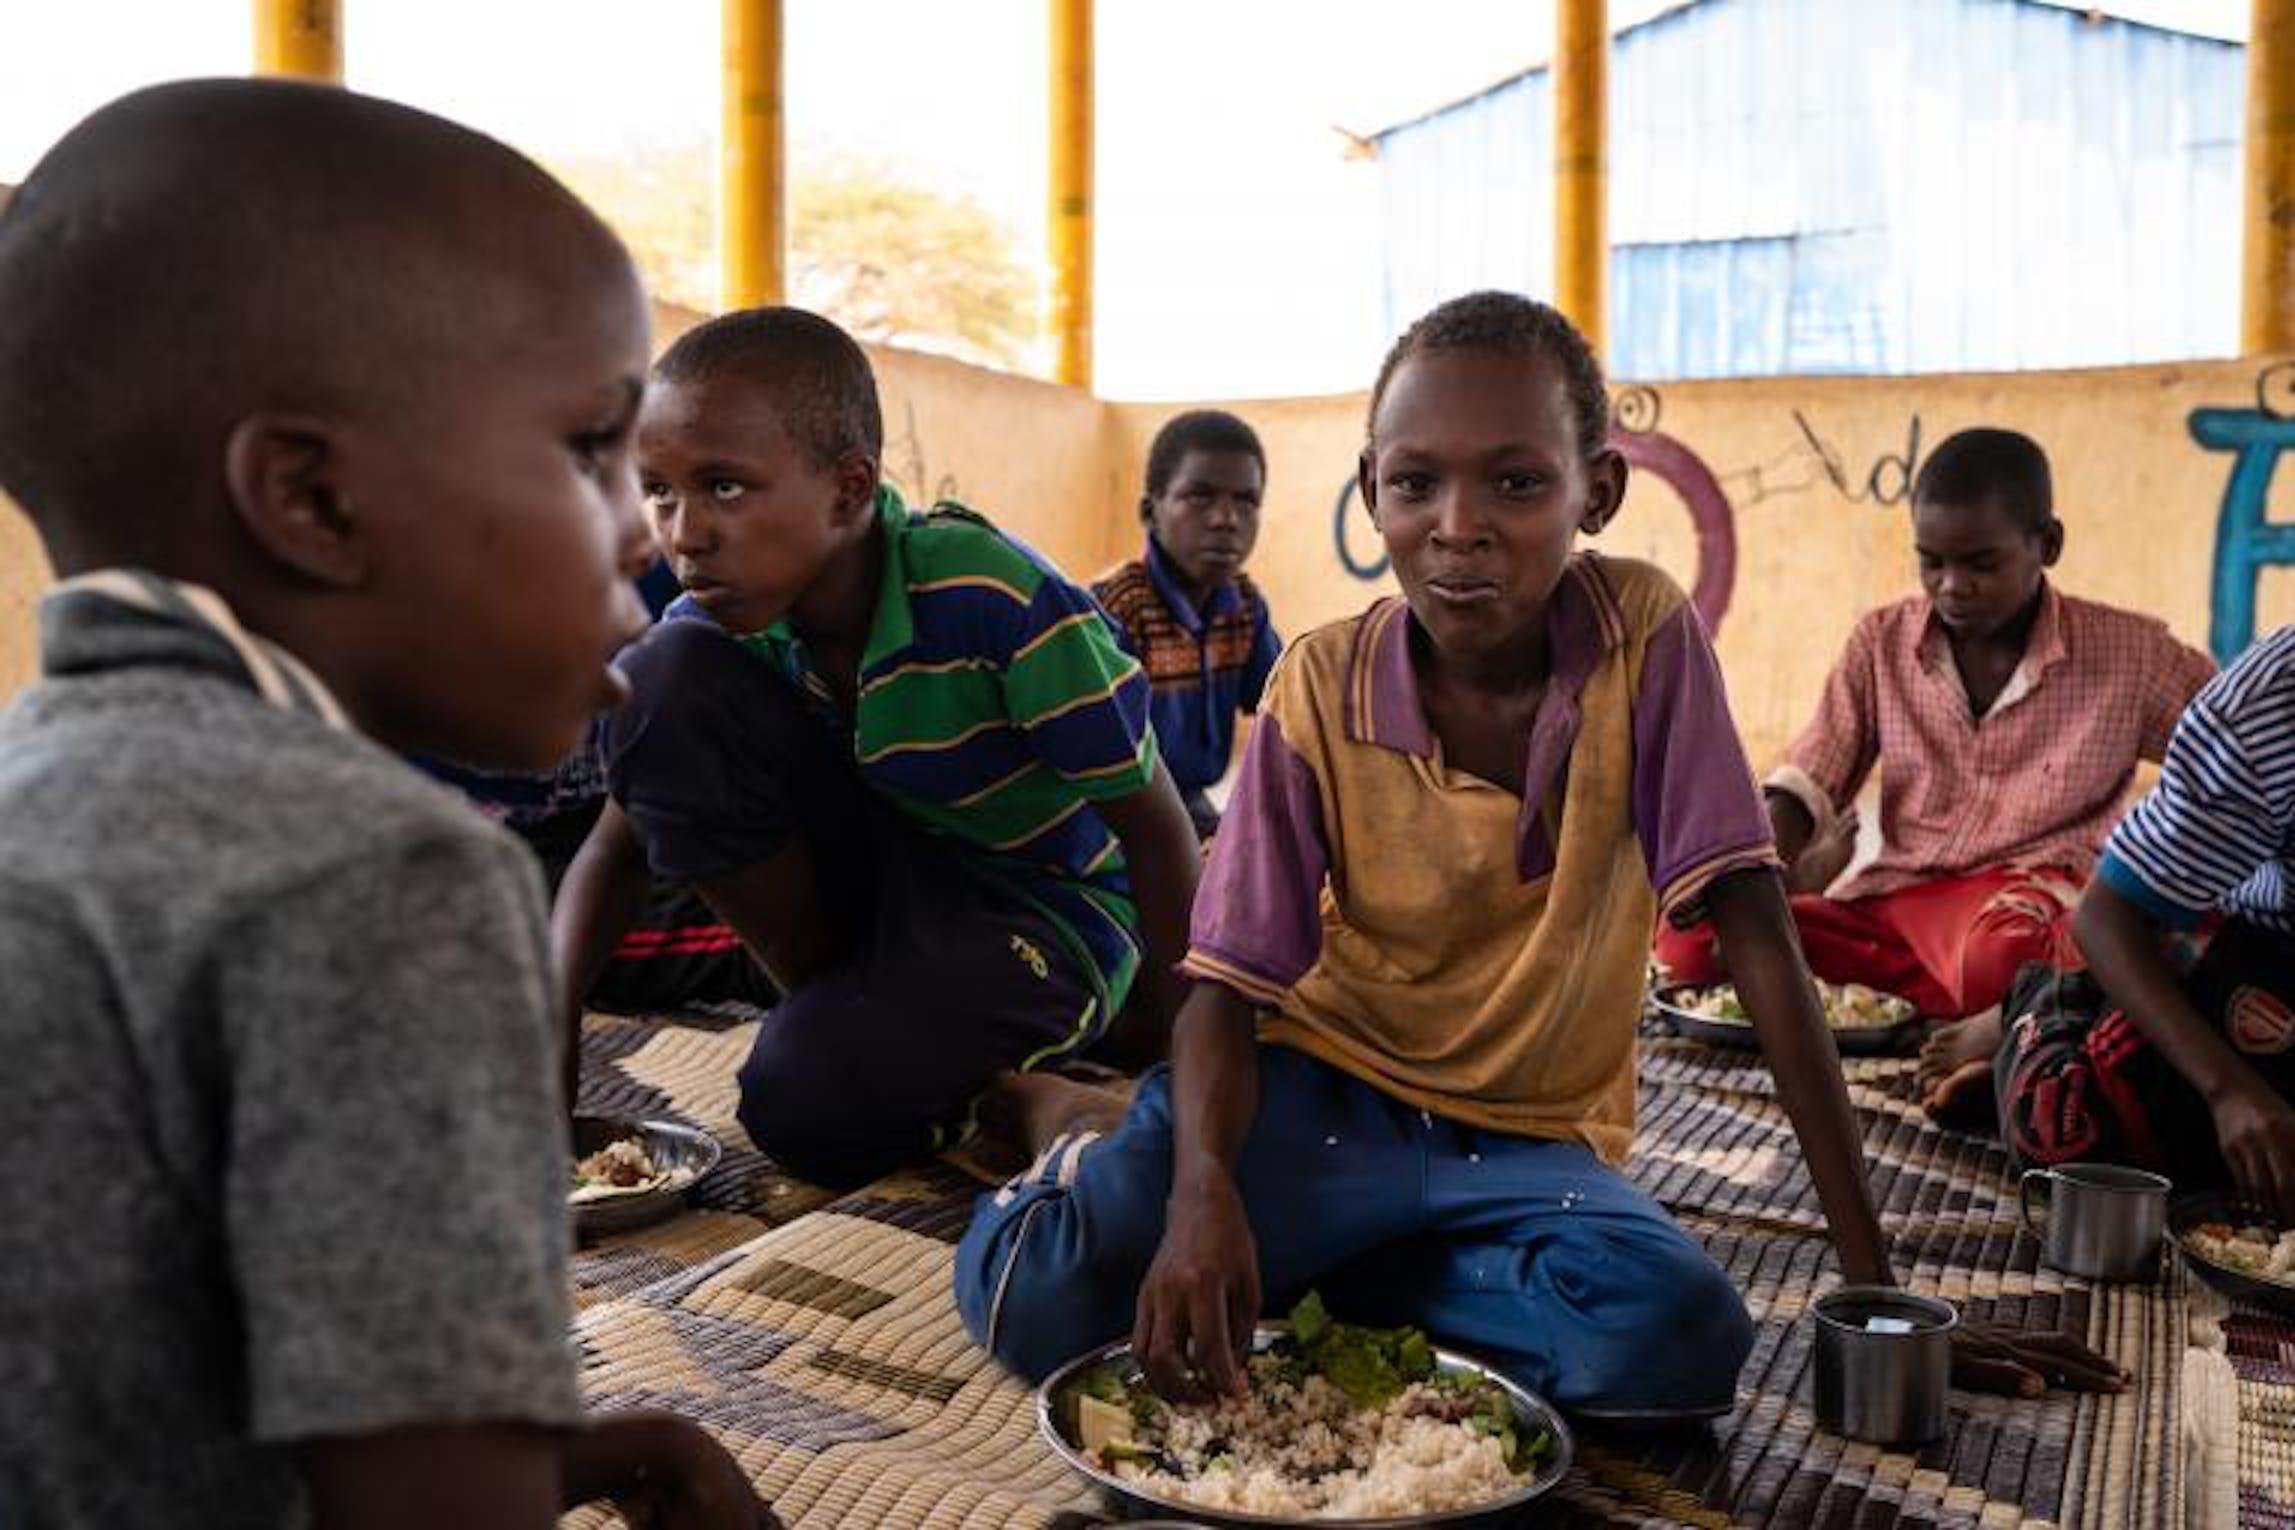 © UNICEF/UN0307575/Knowles-Coursin